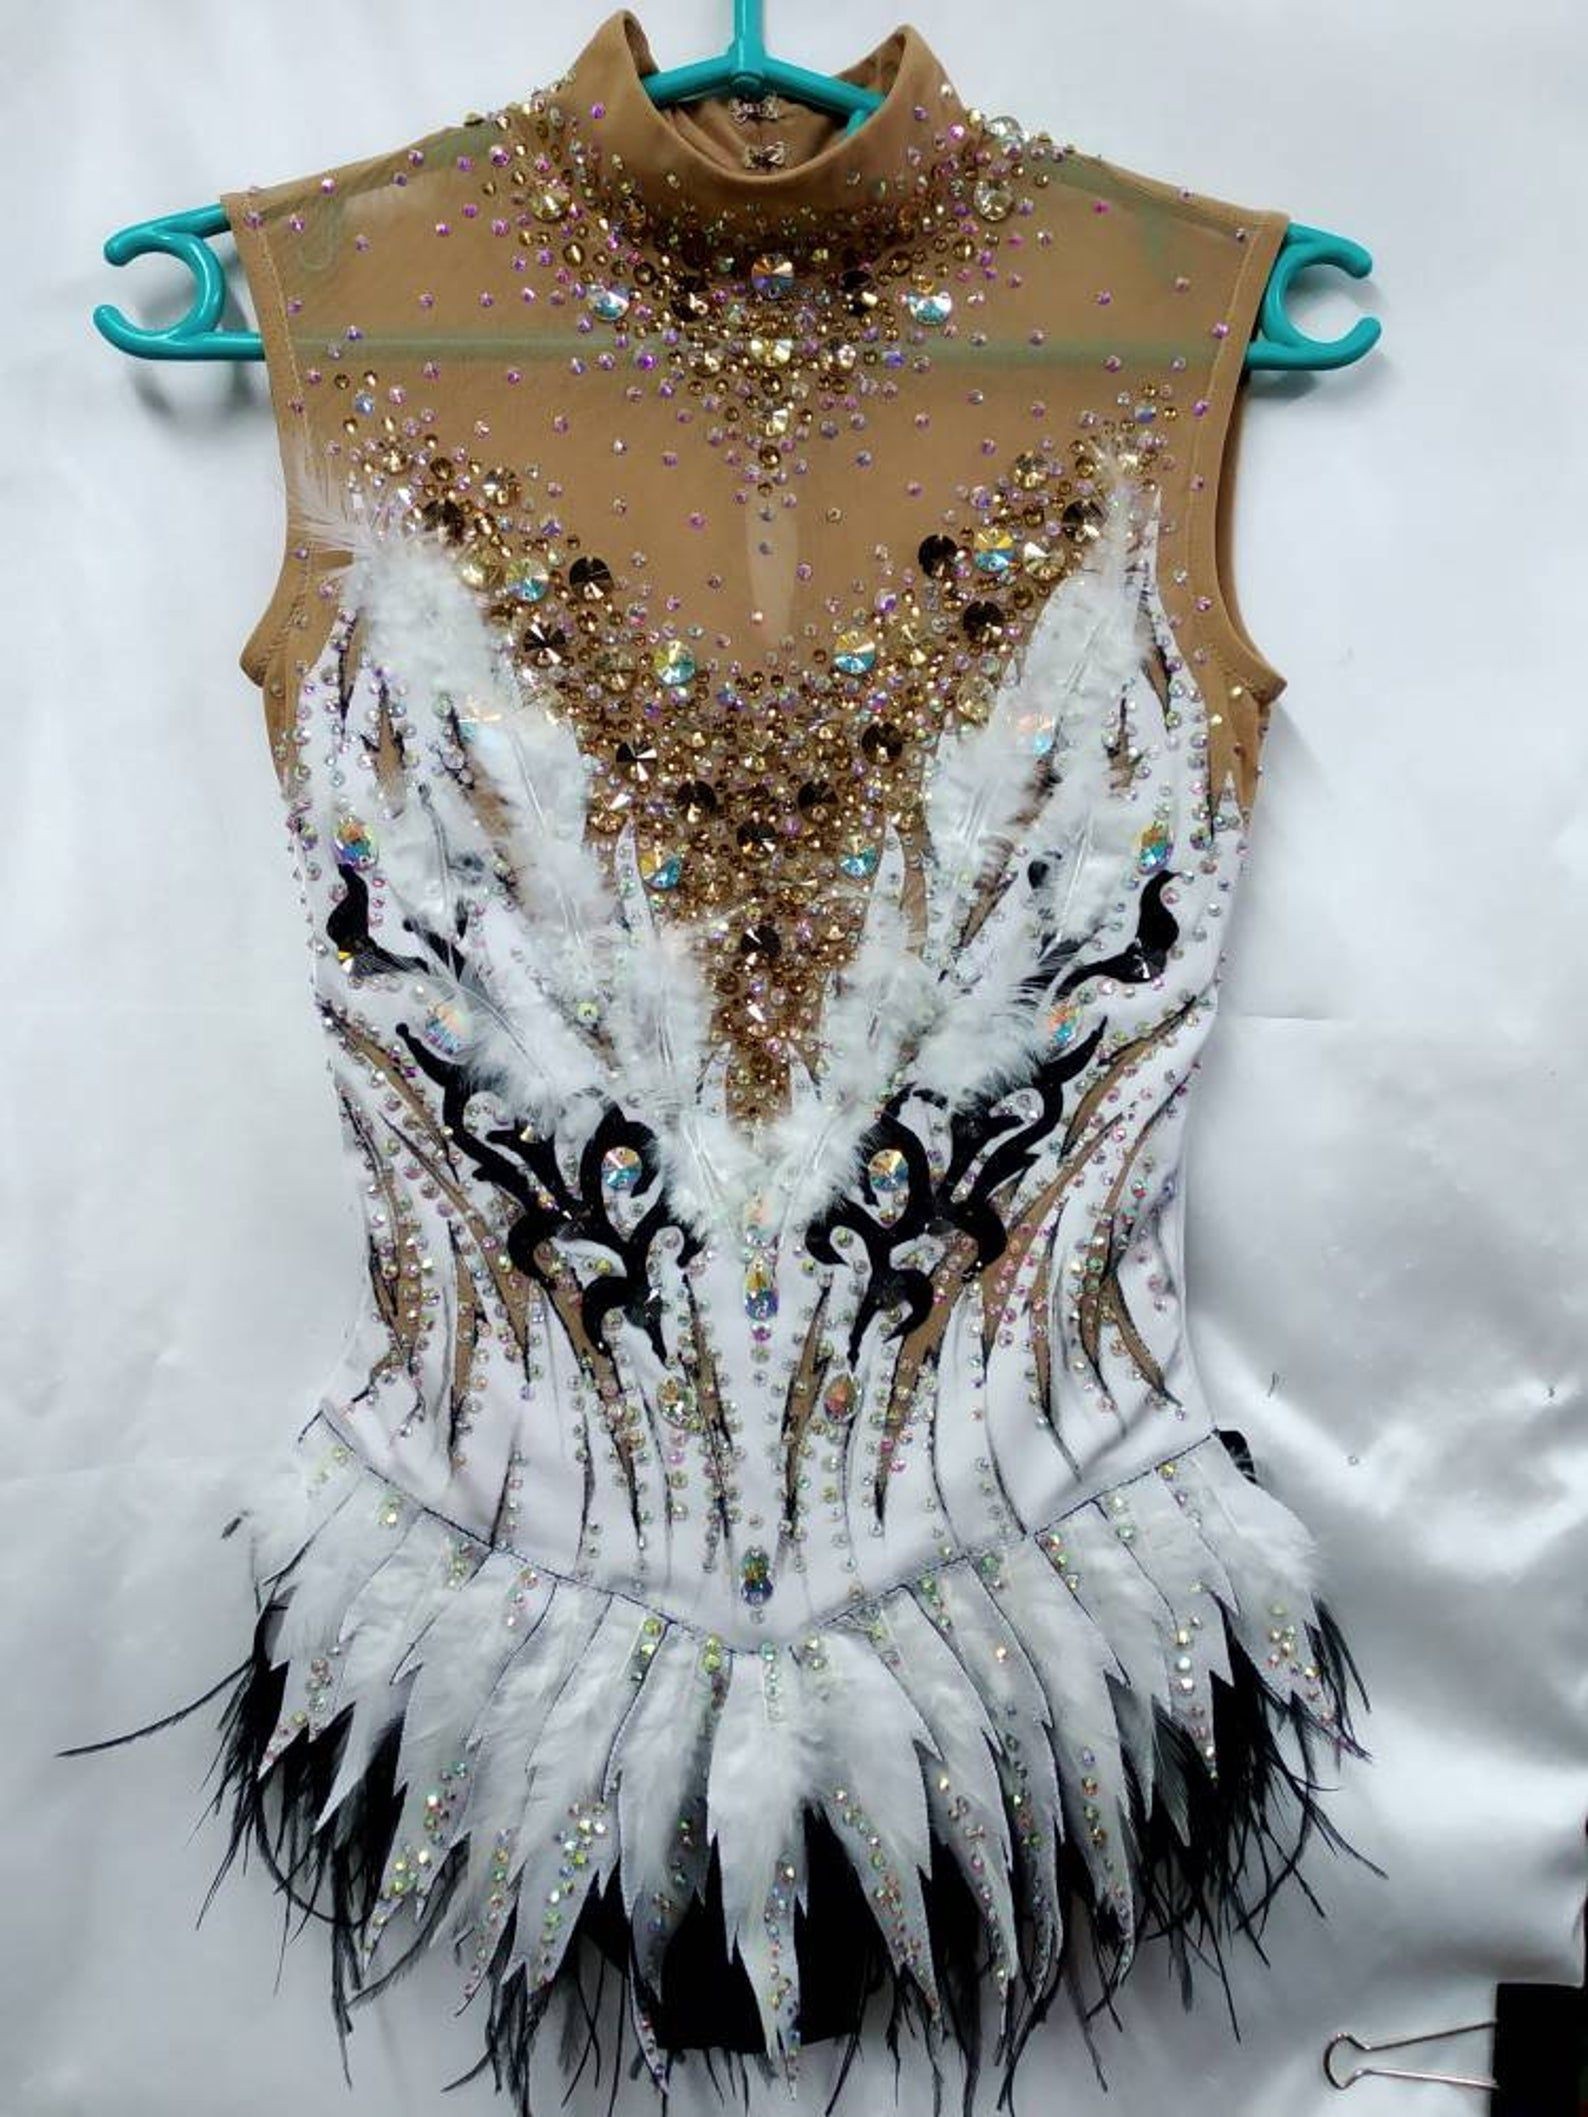 Ice figure skating  Rhythmic gymnastic leotard  Rhytmics gymnastics leotard  RG leotard to order  ballroom dress